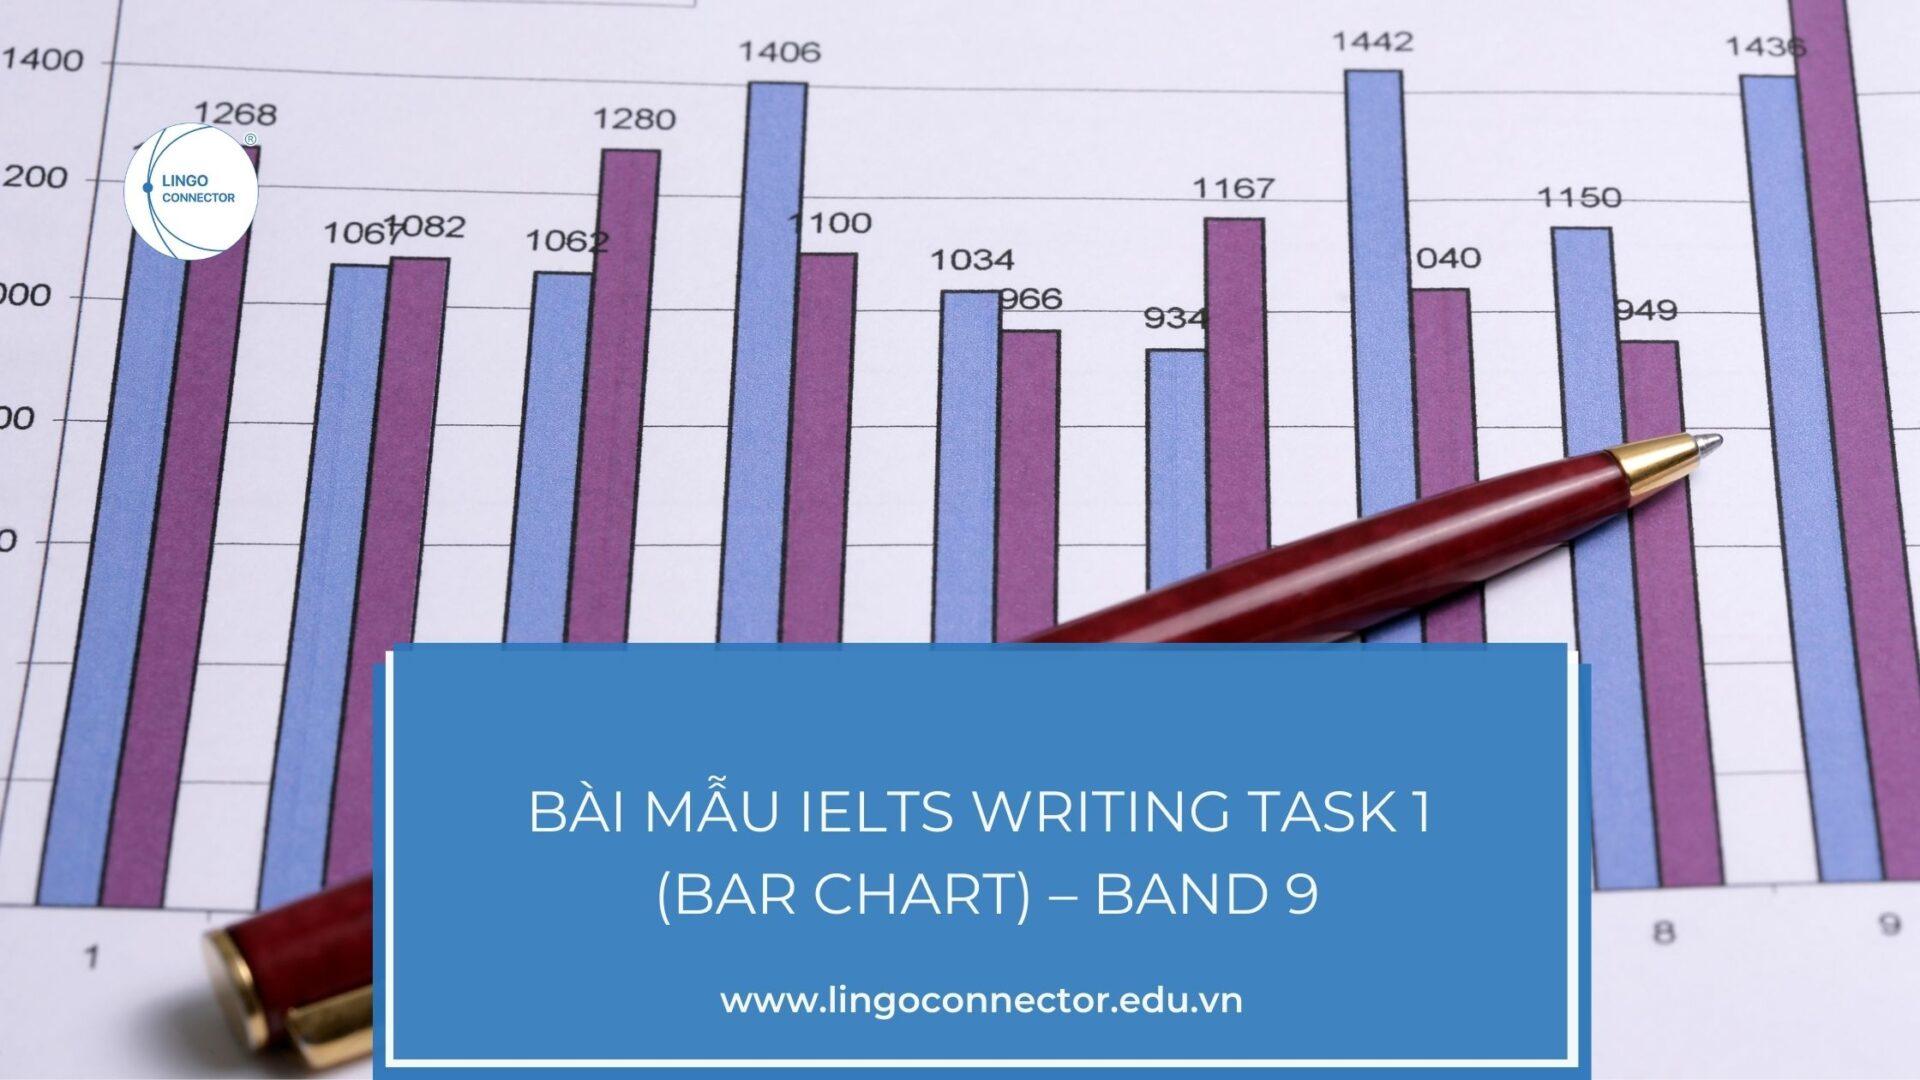 Bài mẫu IELTS Writing Task 1 (Bar chart) – Band 9